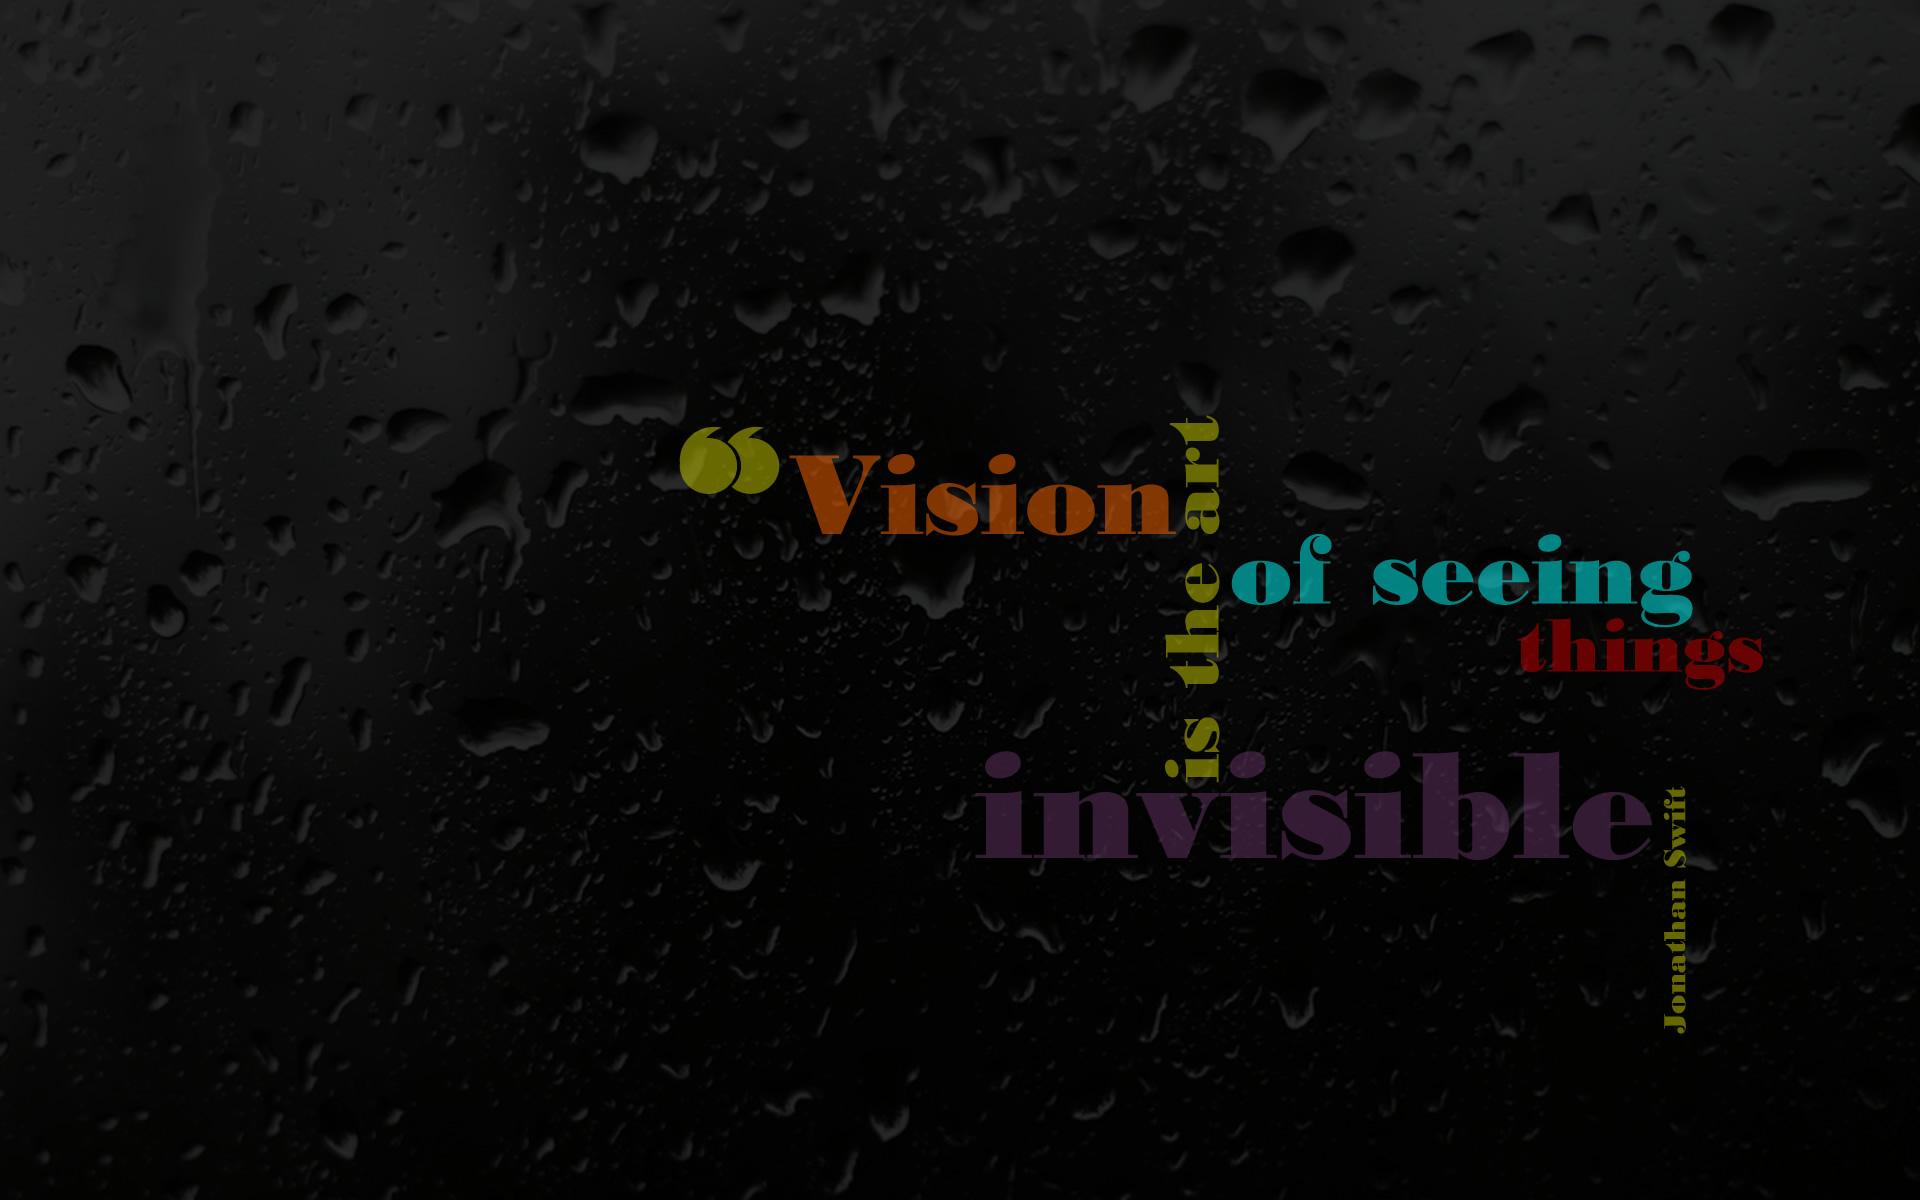 Inspirational Quotes Wallpaper For Desktop QuotesGram 1920x1200